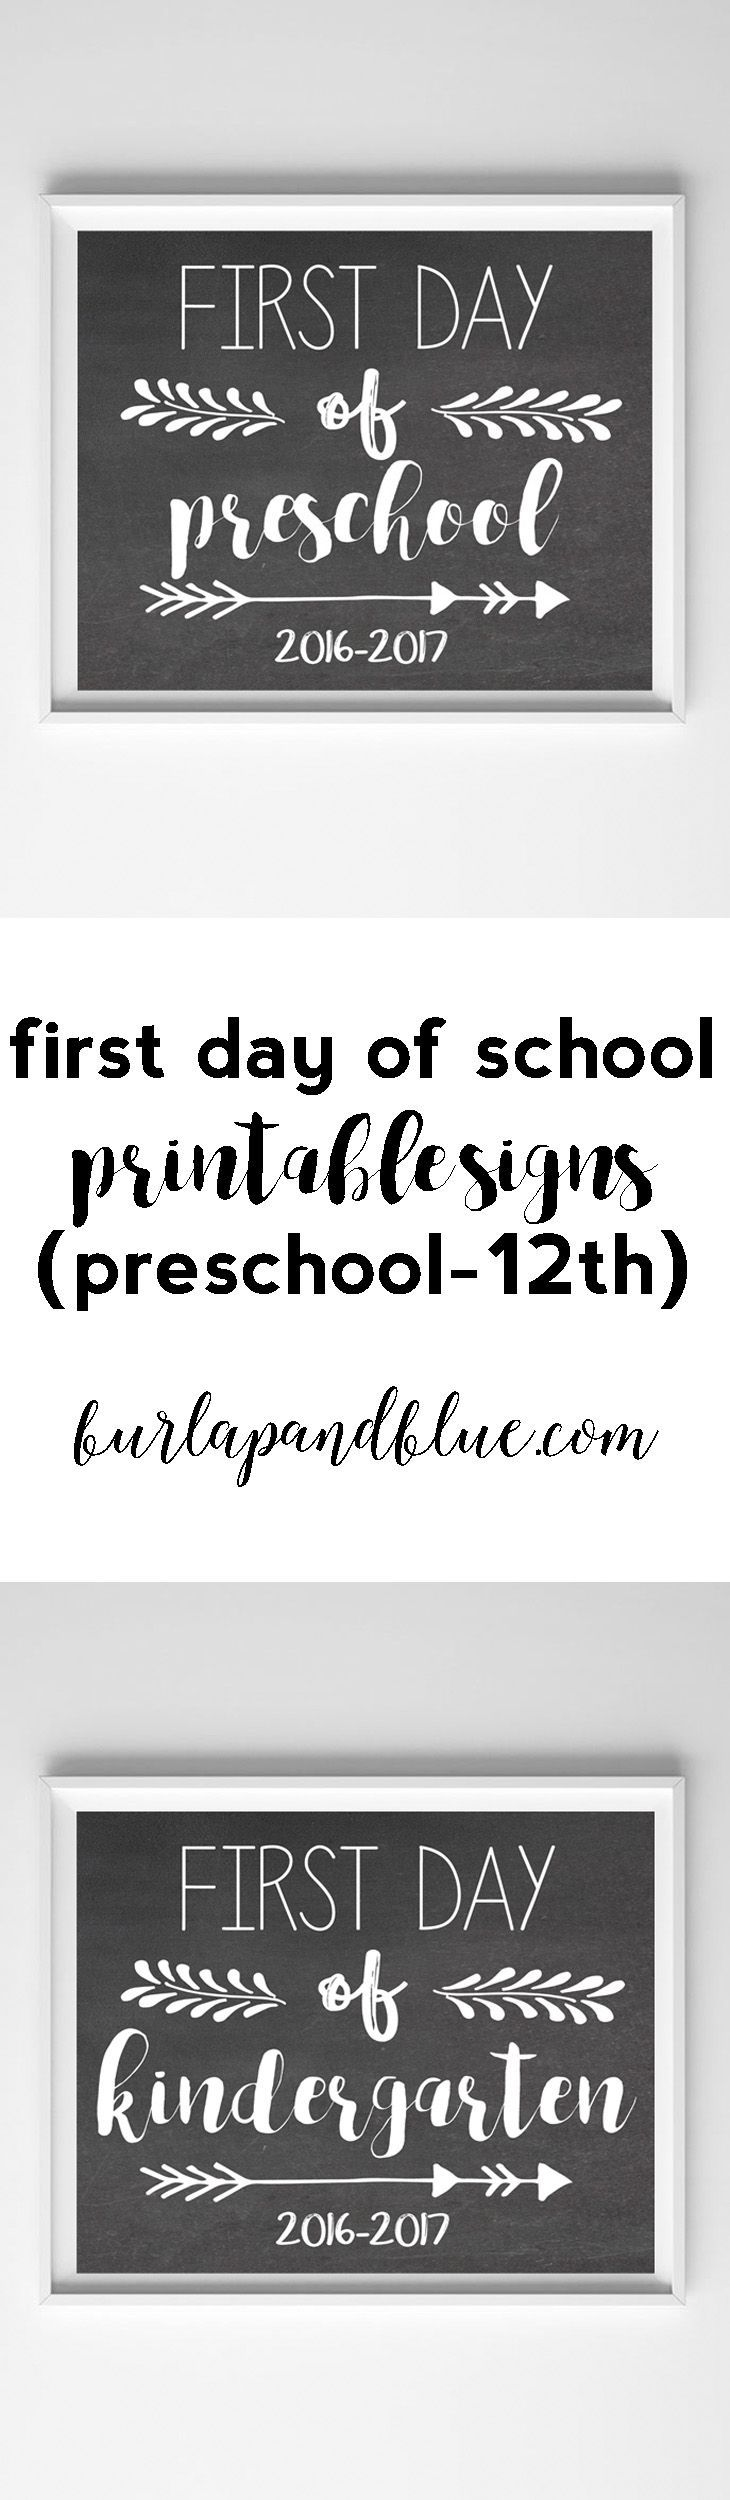 1061 best Kindergarten Fun images on Pinterest | Day care, Reading ...